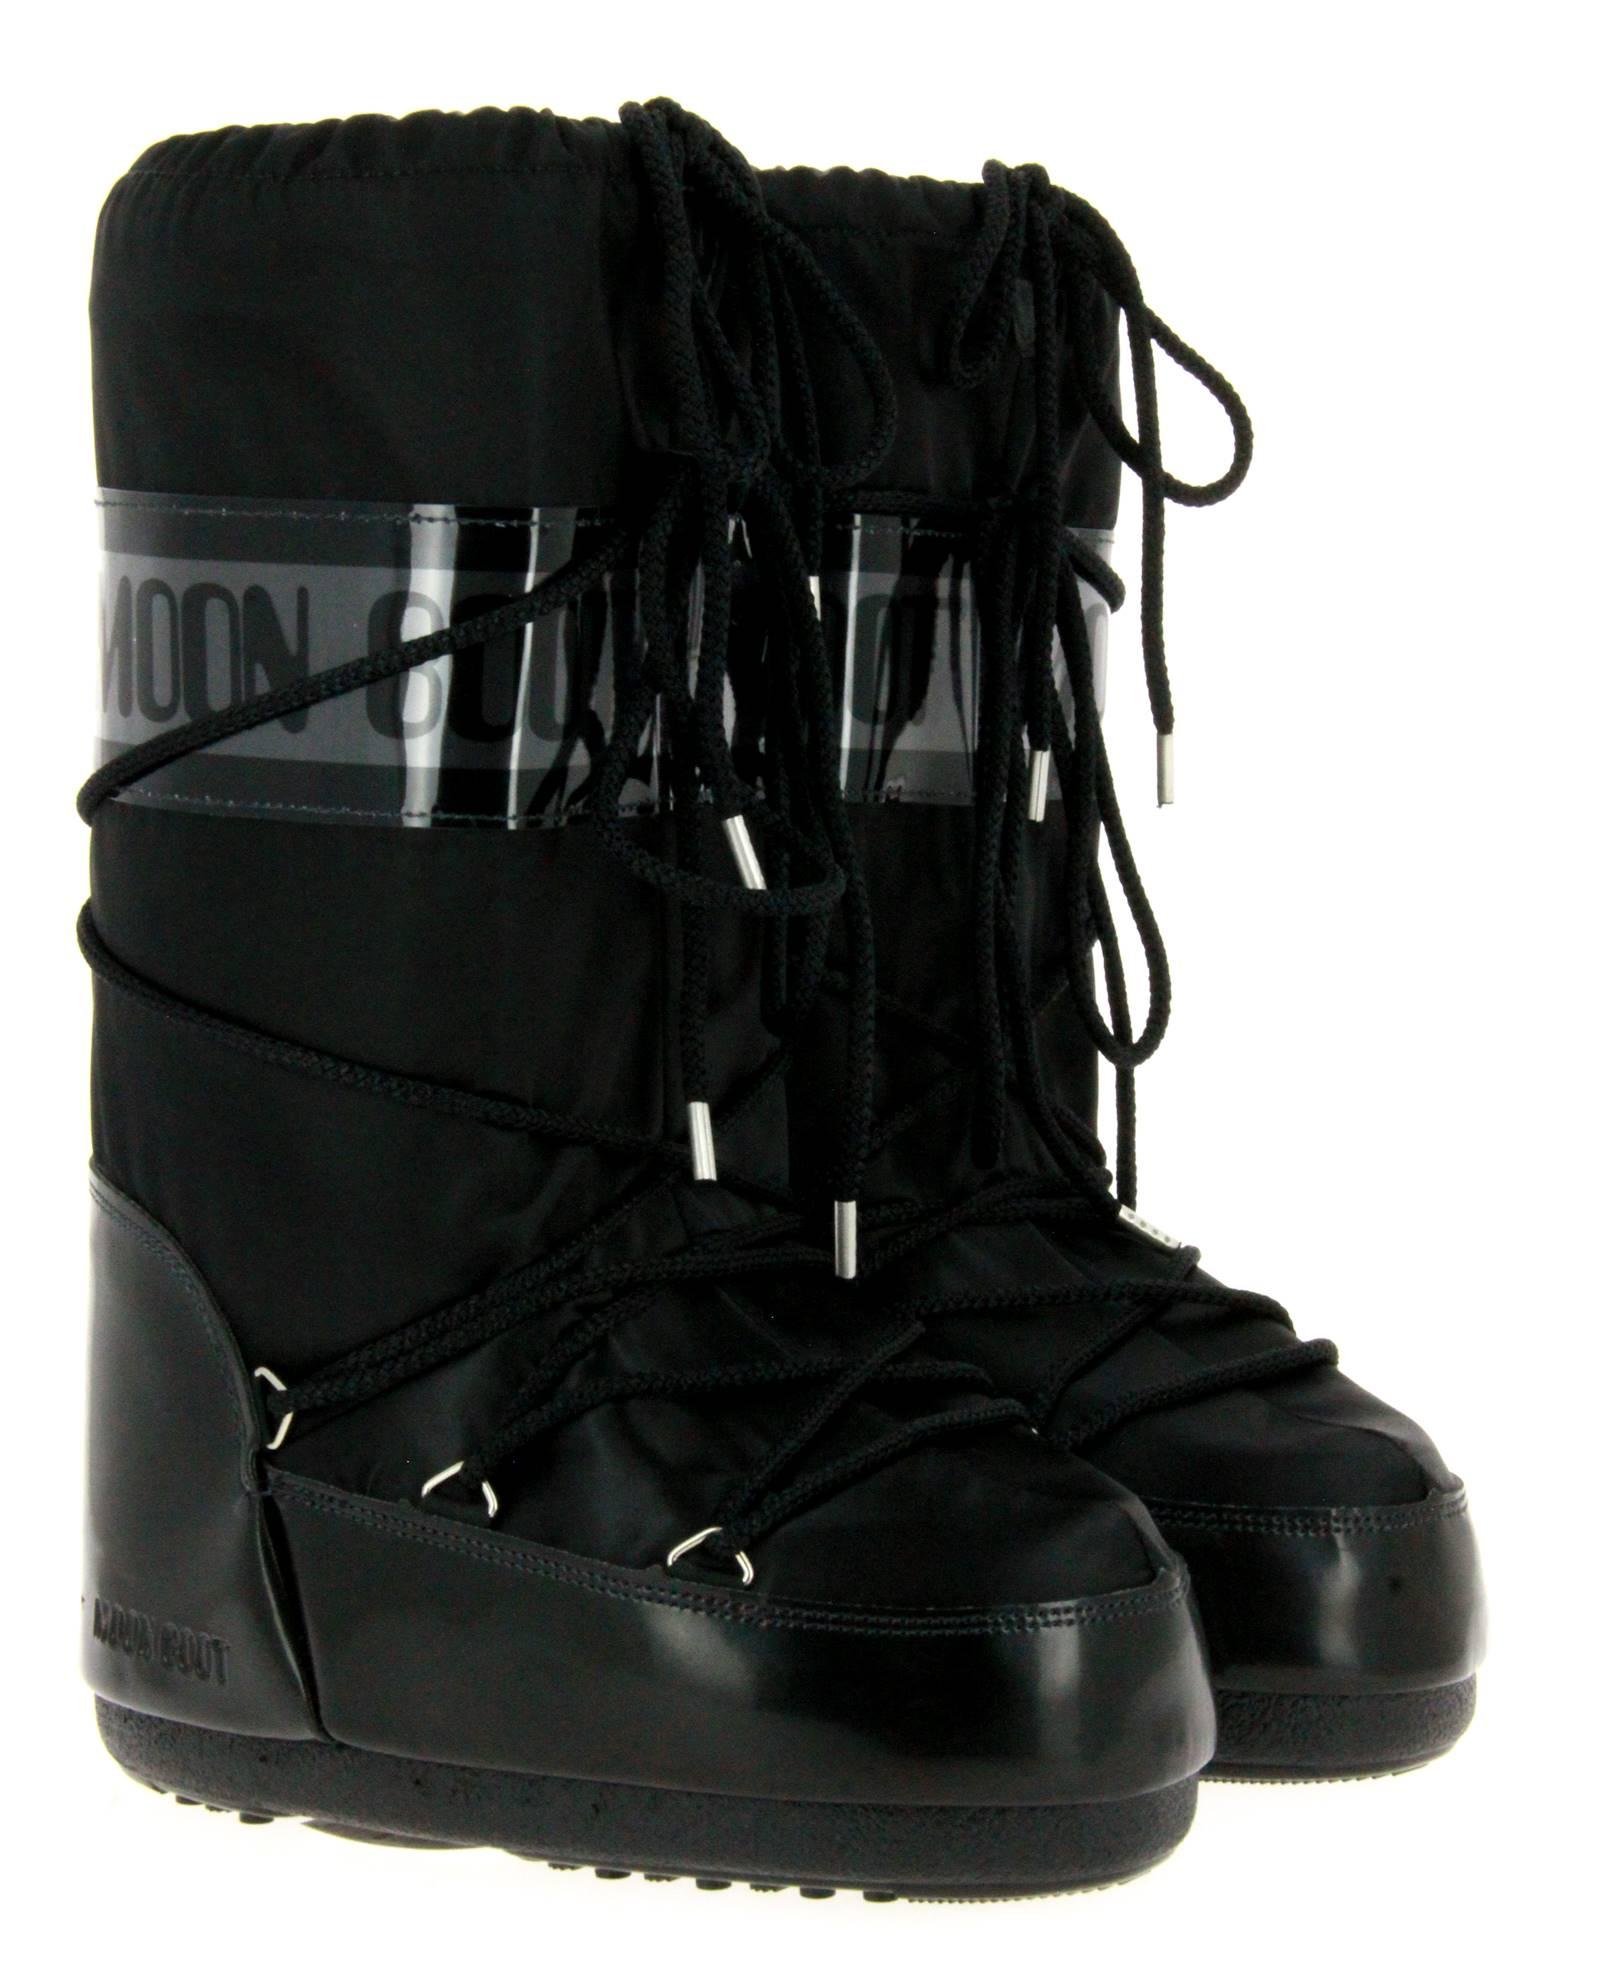 Moon Boot snow boots GLANCE BLACK